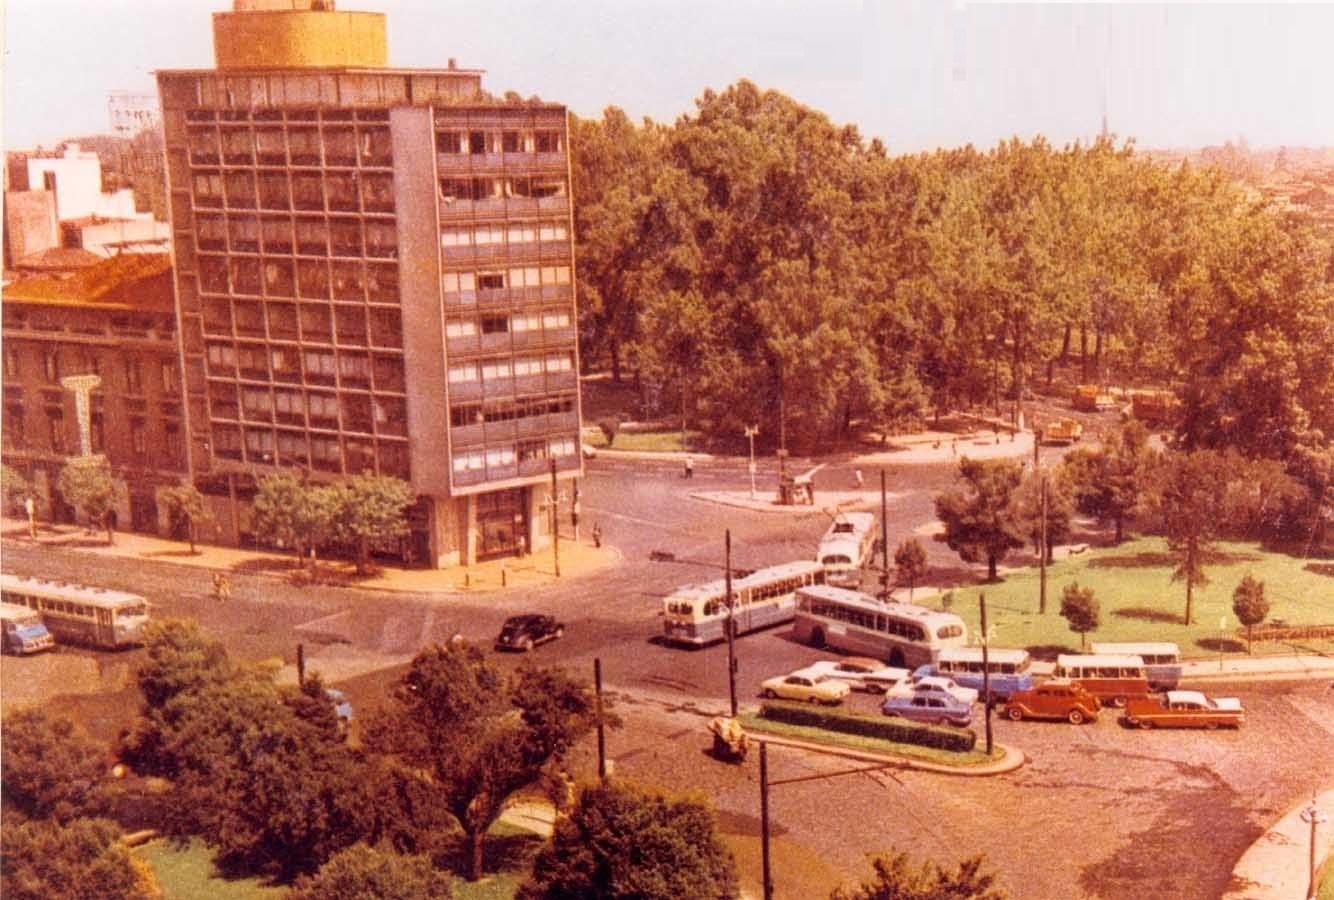 Enterreno - Fotos históricas de chile - fotos antiguas de Chile - Plaza Baquedano, 1960